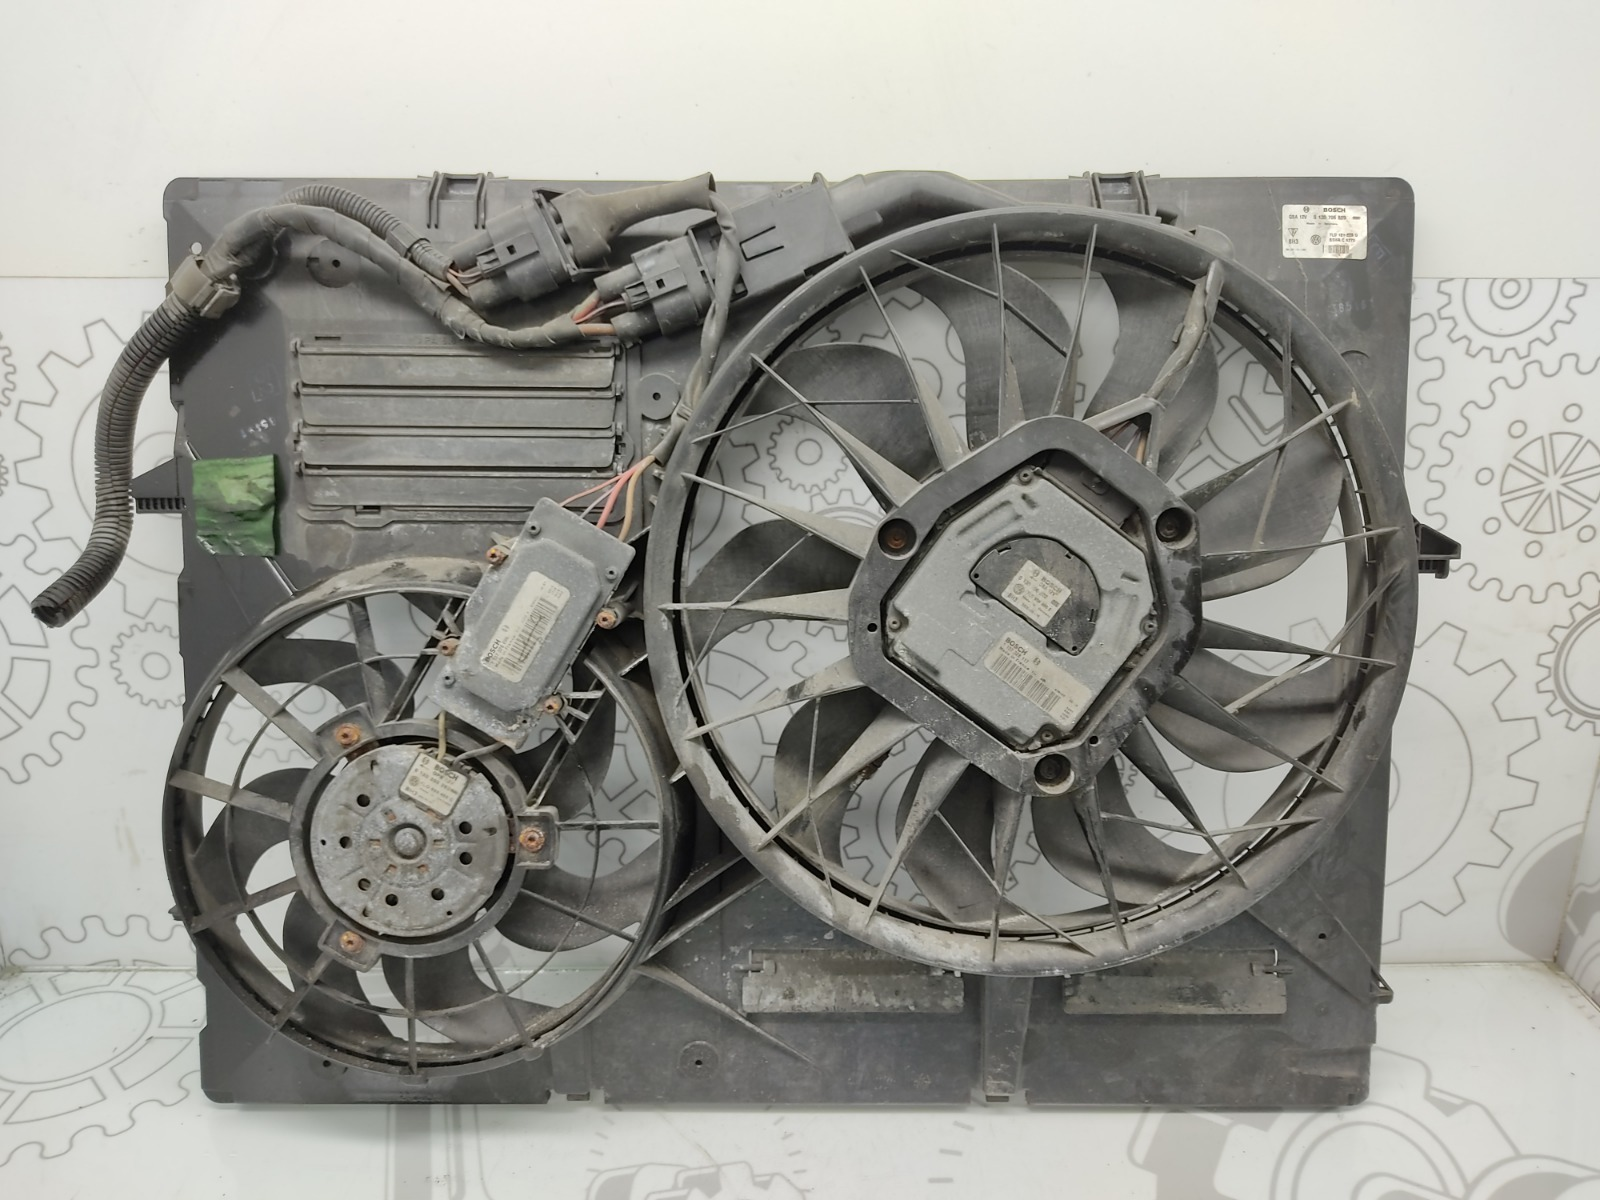 Вентилятор радиатора Porsche Cayenne 955 4.5 I 2003 (б/у)